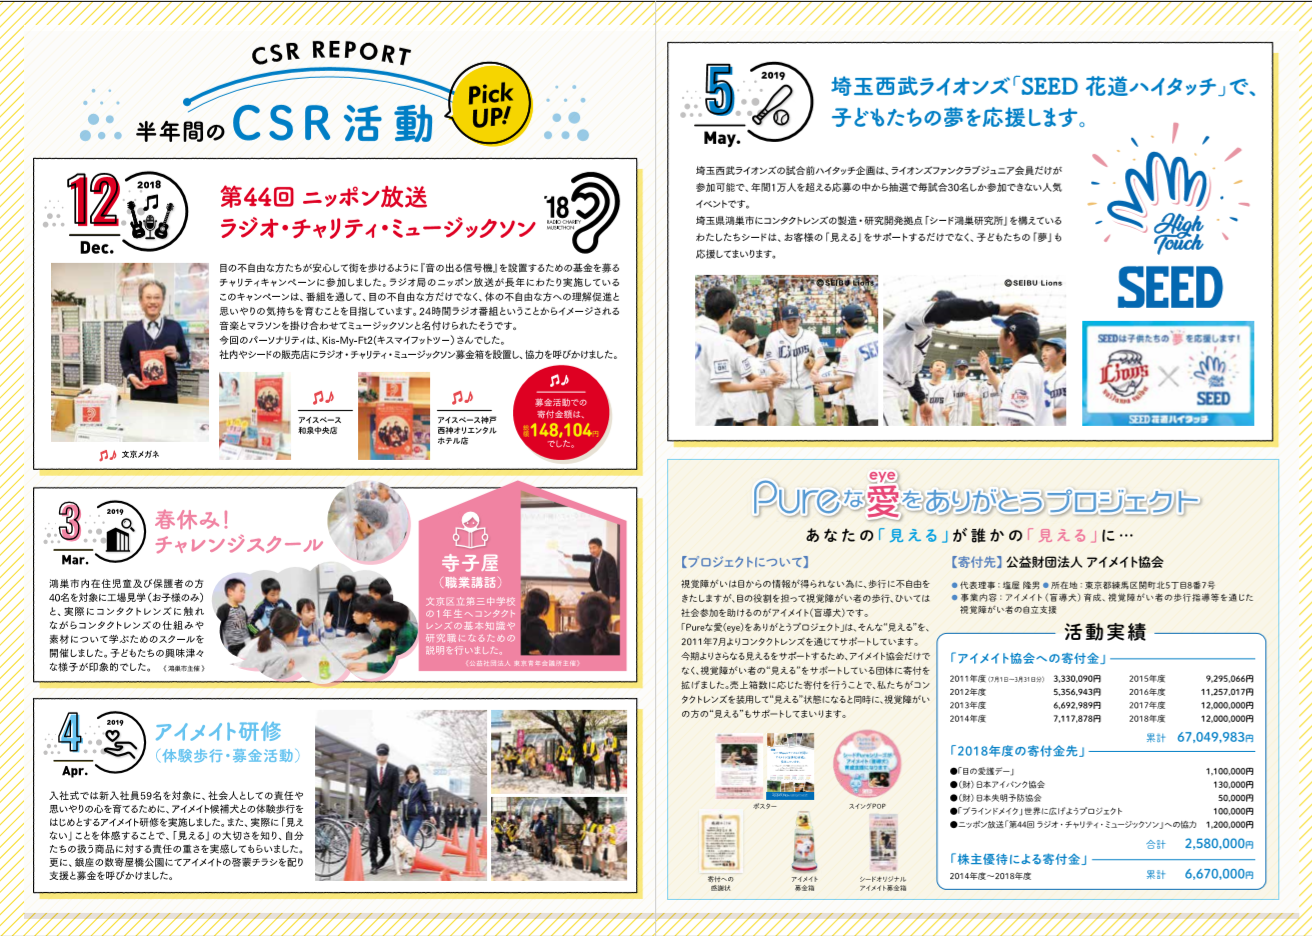 https://www.seed.co.jp/blog/eyemate/88b9996333c06a3e5e0ee7594d658d2a61a625a8.png